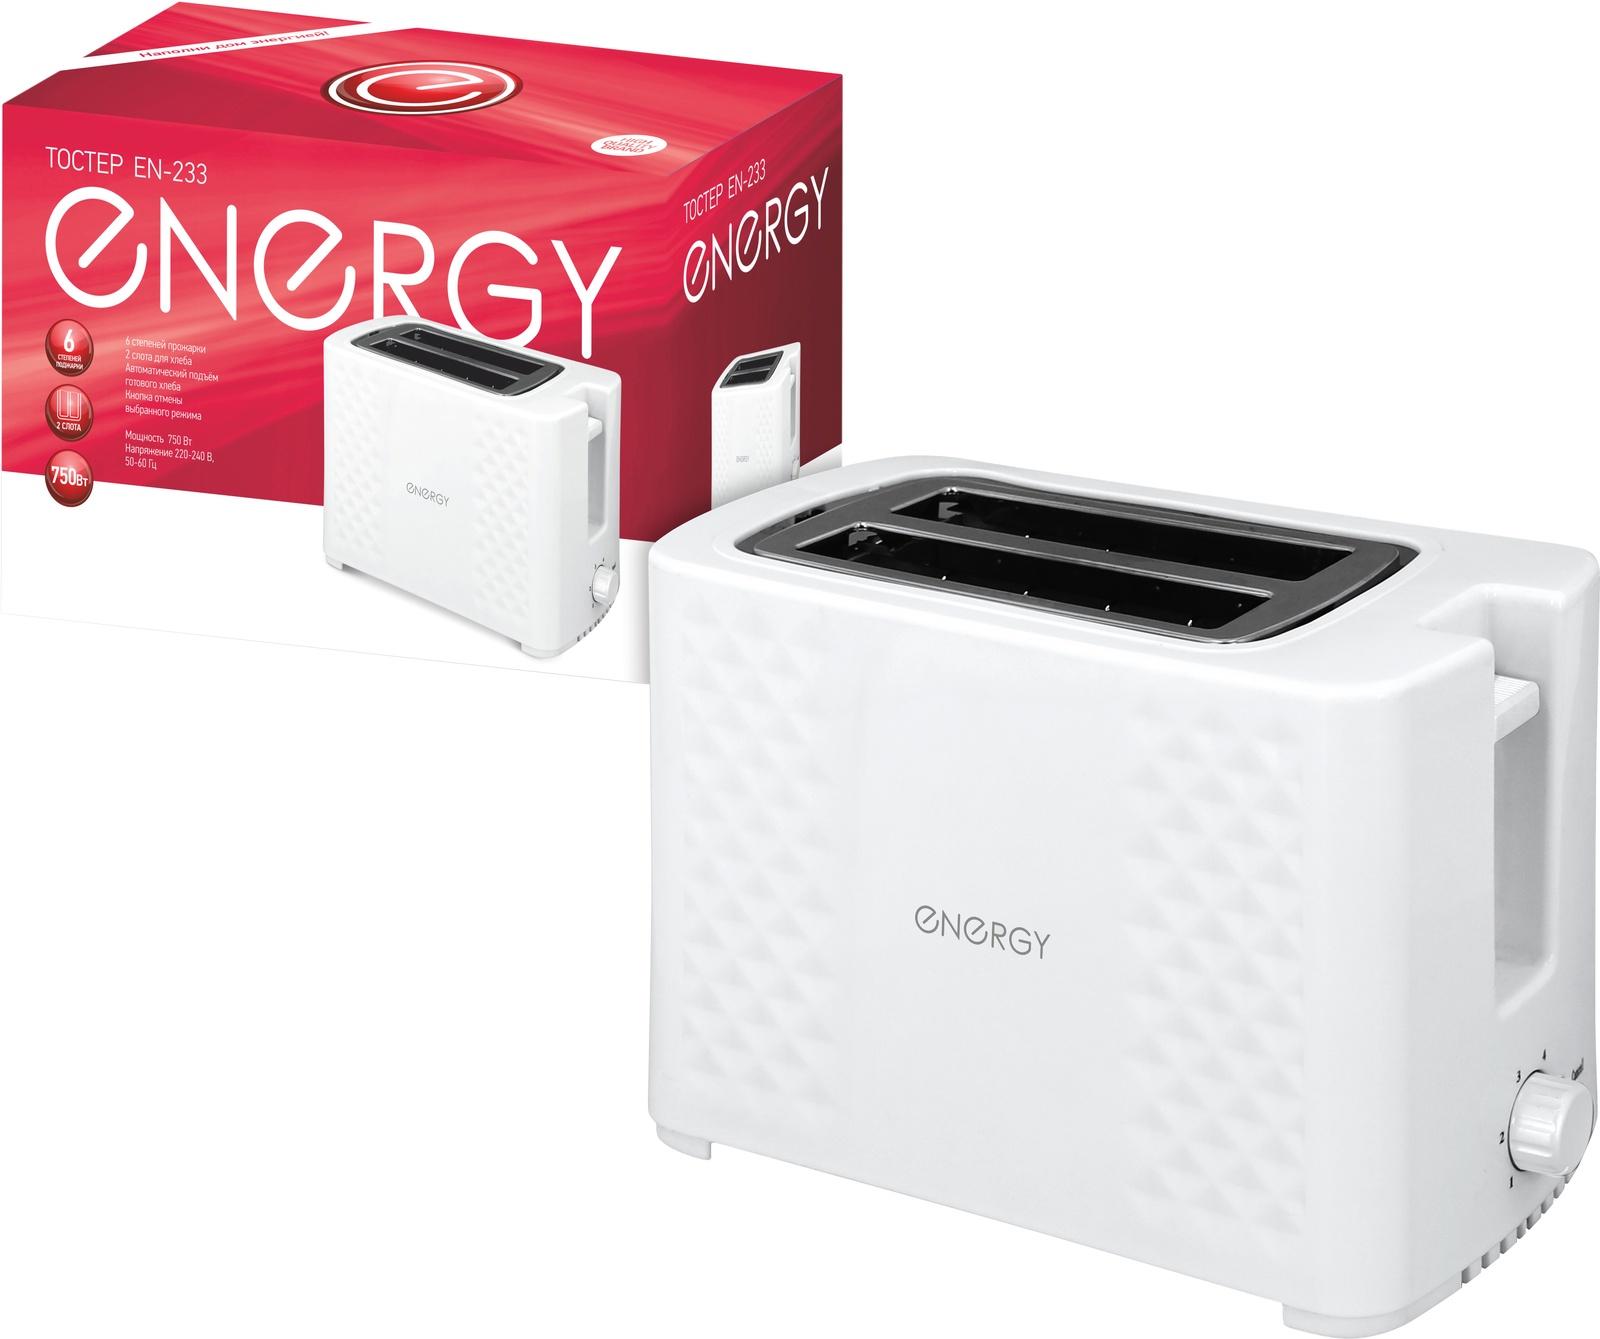 Тостер ENERGY EN-233, 54 004715, белый